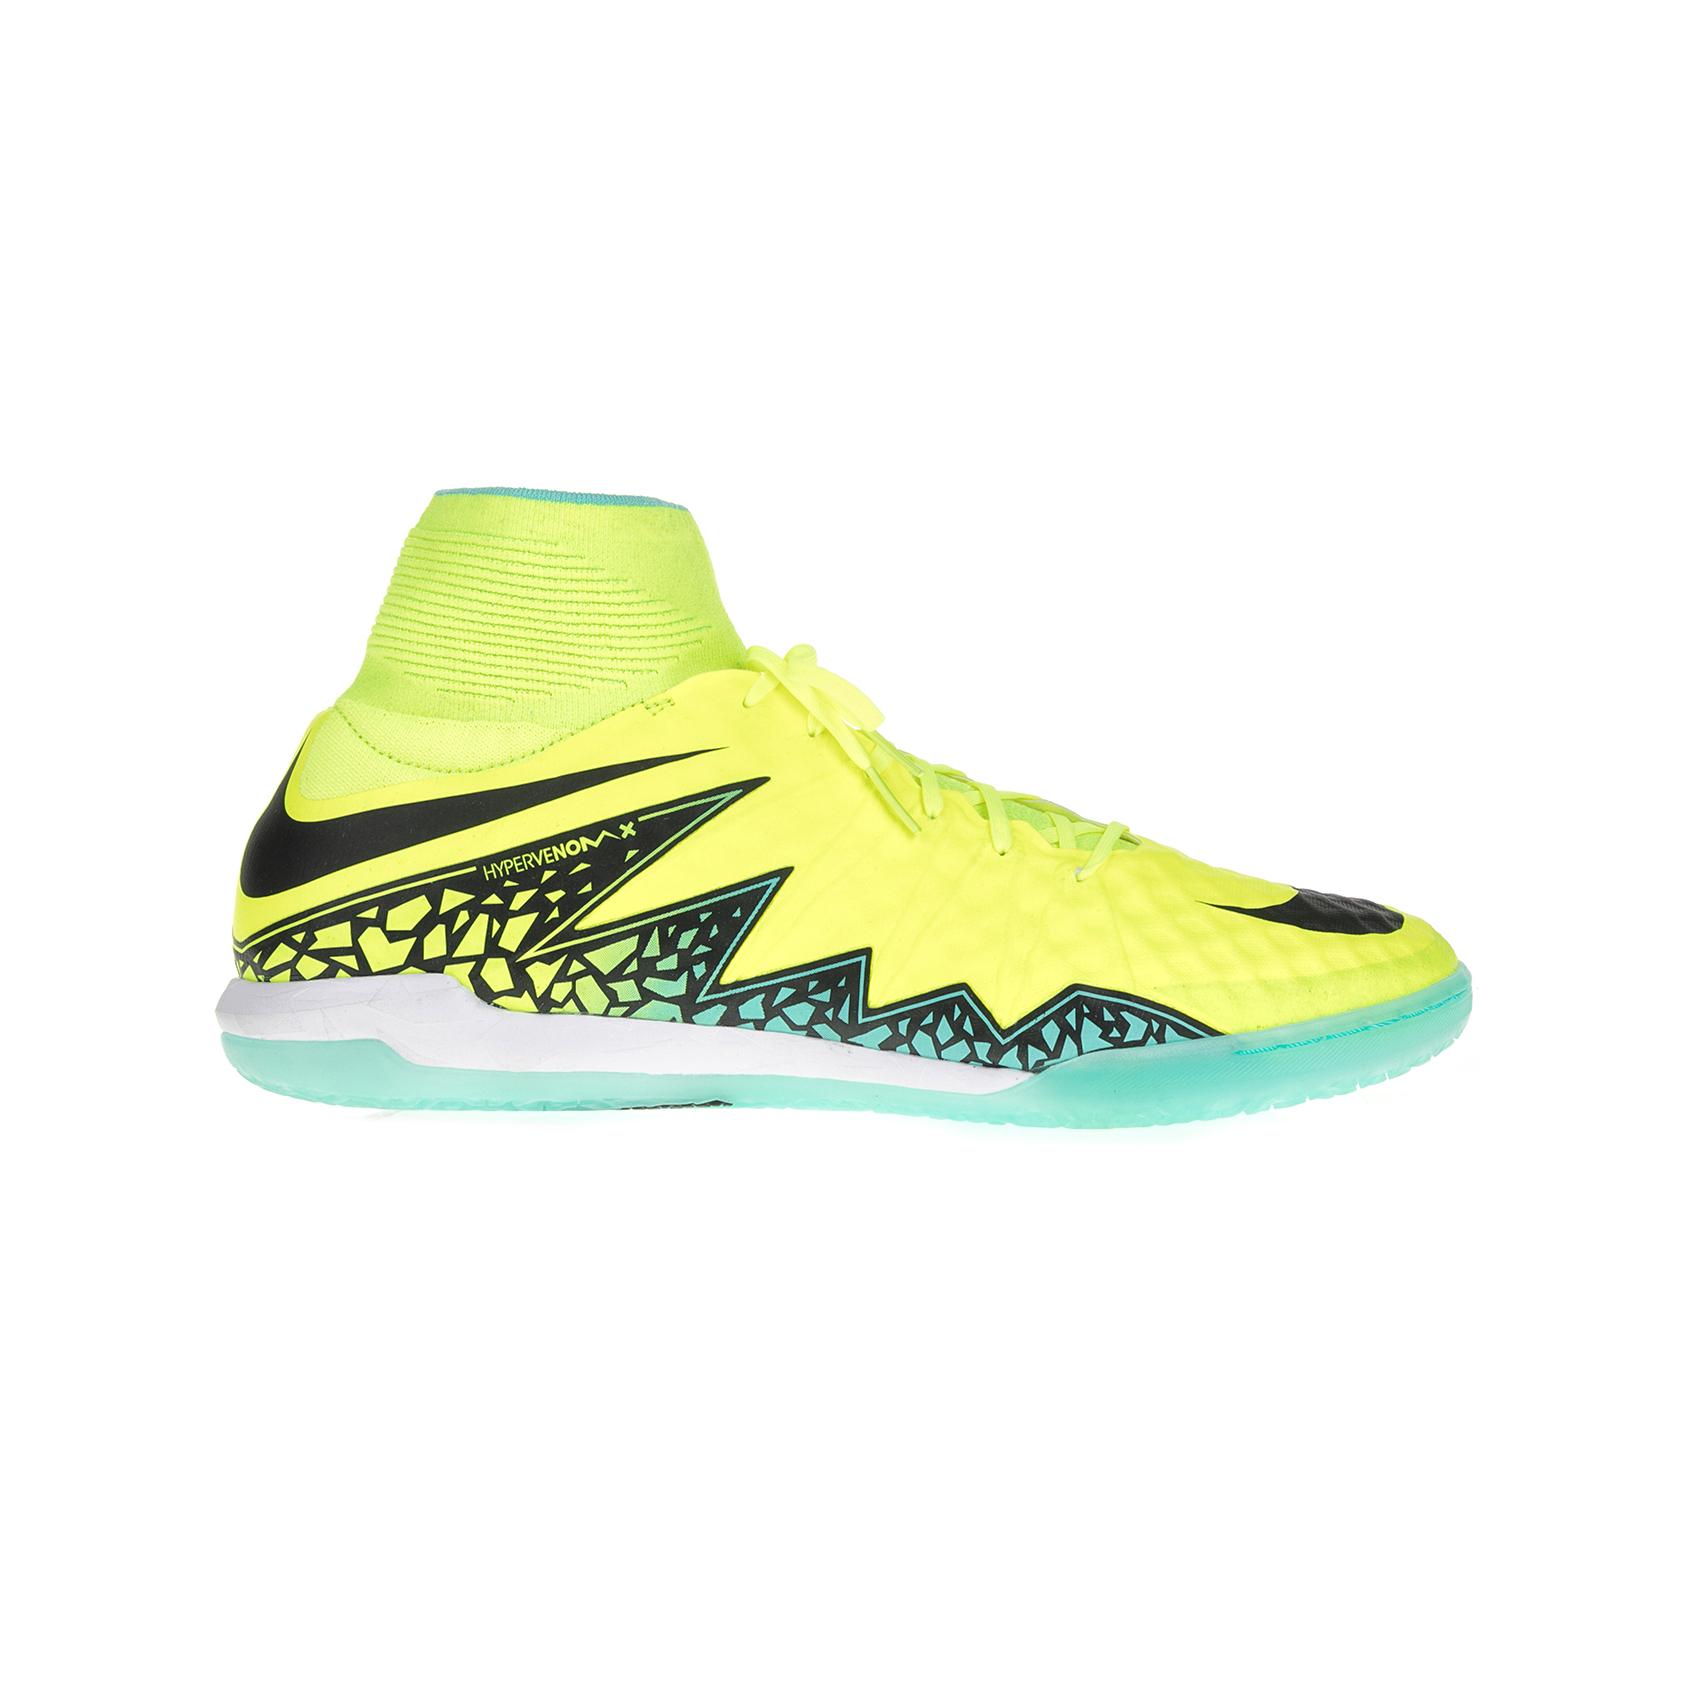 NIKE – Ανδρικά παπούτσια Nike HYPERVENOMX PROXIMO IC κίτρινα